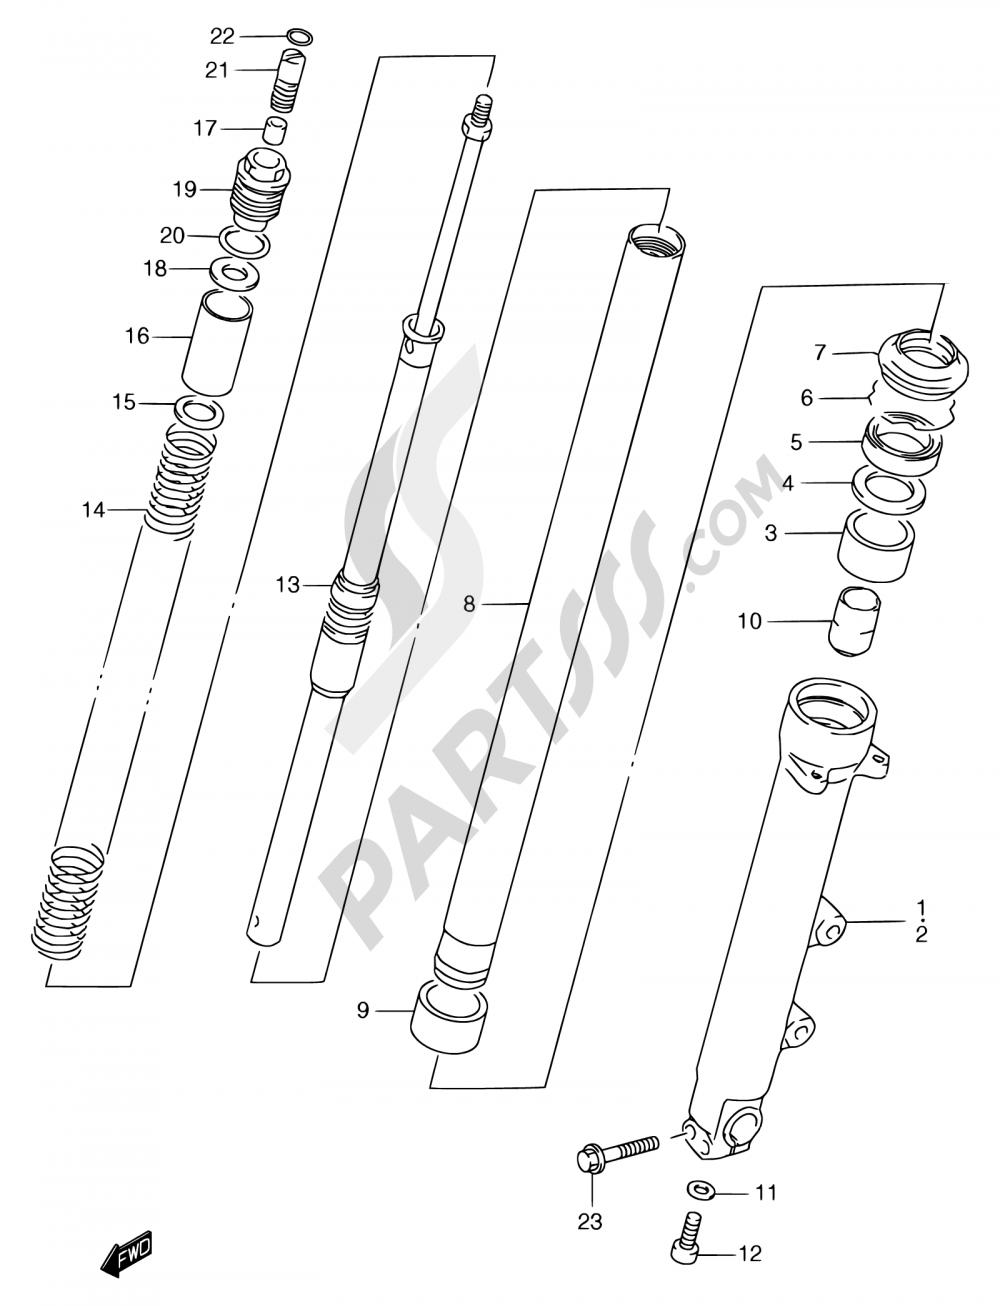 46 - FRONT DAMPER (GSF1200T/V/W/X/Y/ST/SV/SW/SX/SY) Suzuki BANDIT GSF1200 1997